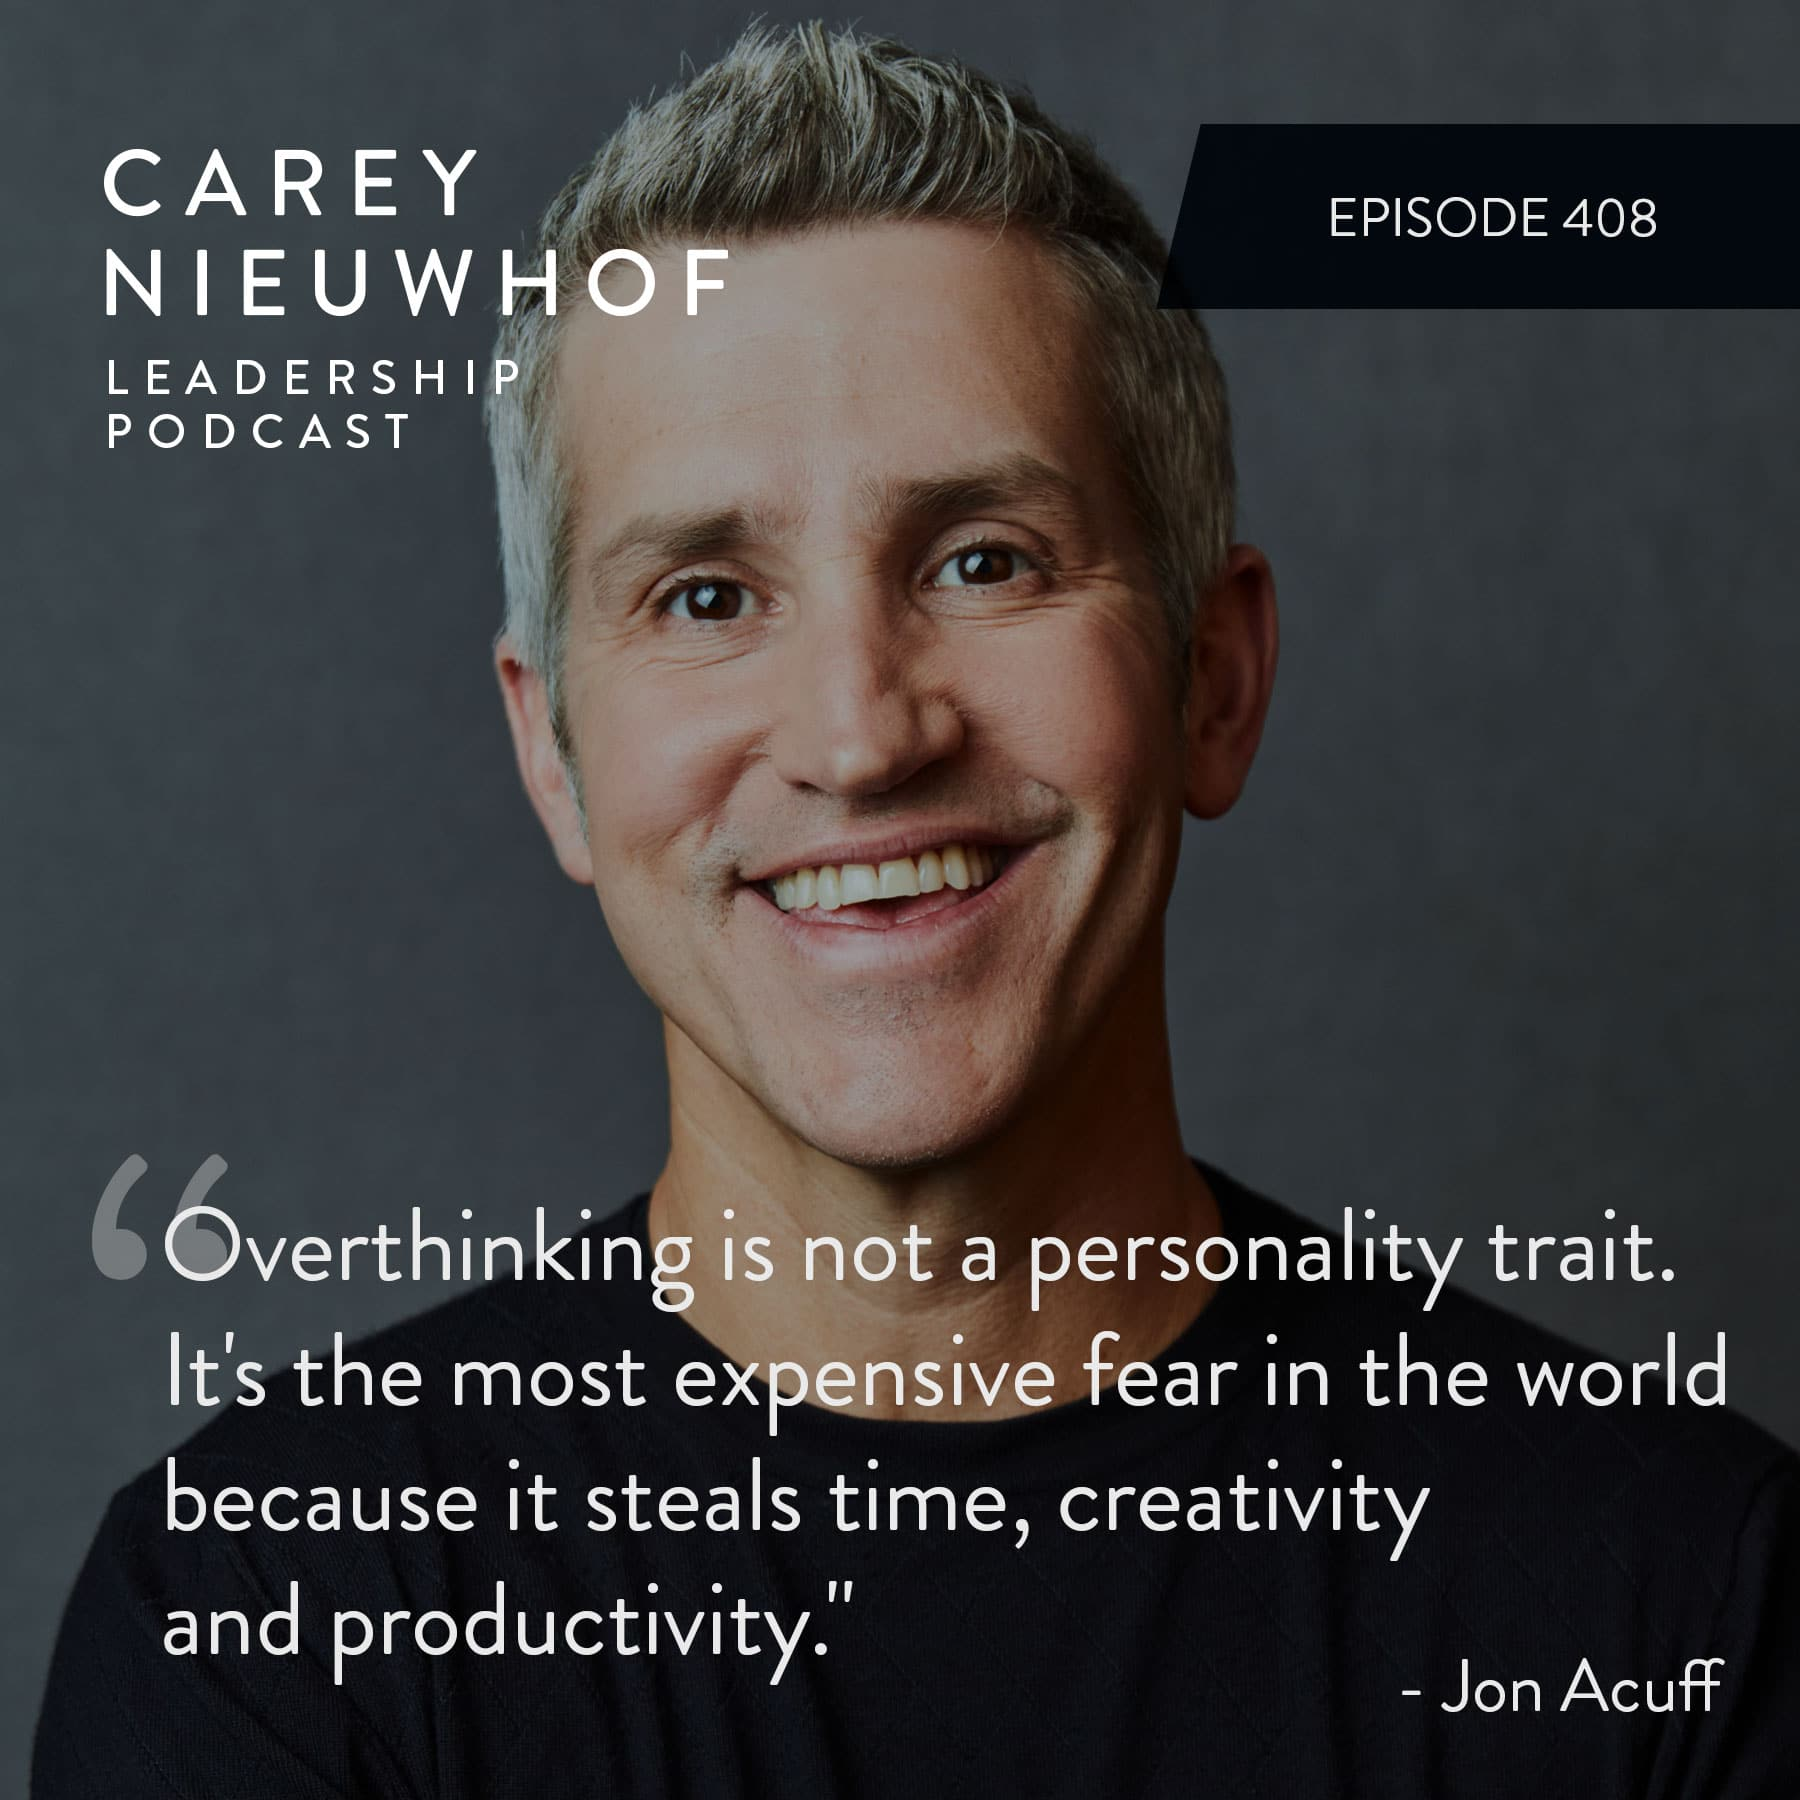 CNLP_PodcastSquare-Jon-Acuff_withEpisode#_1